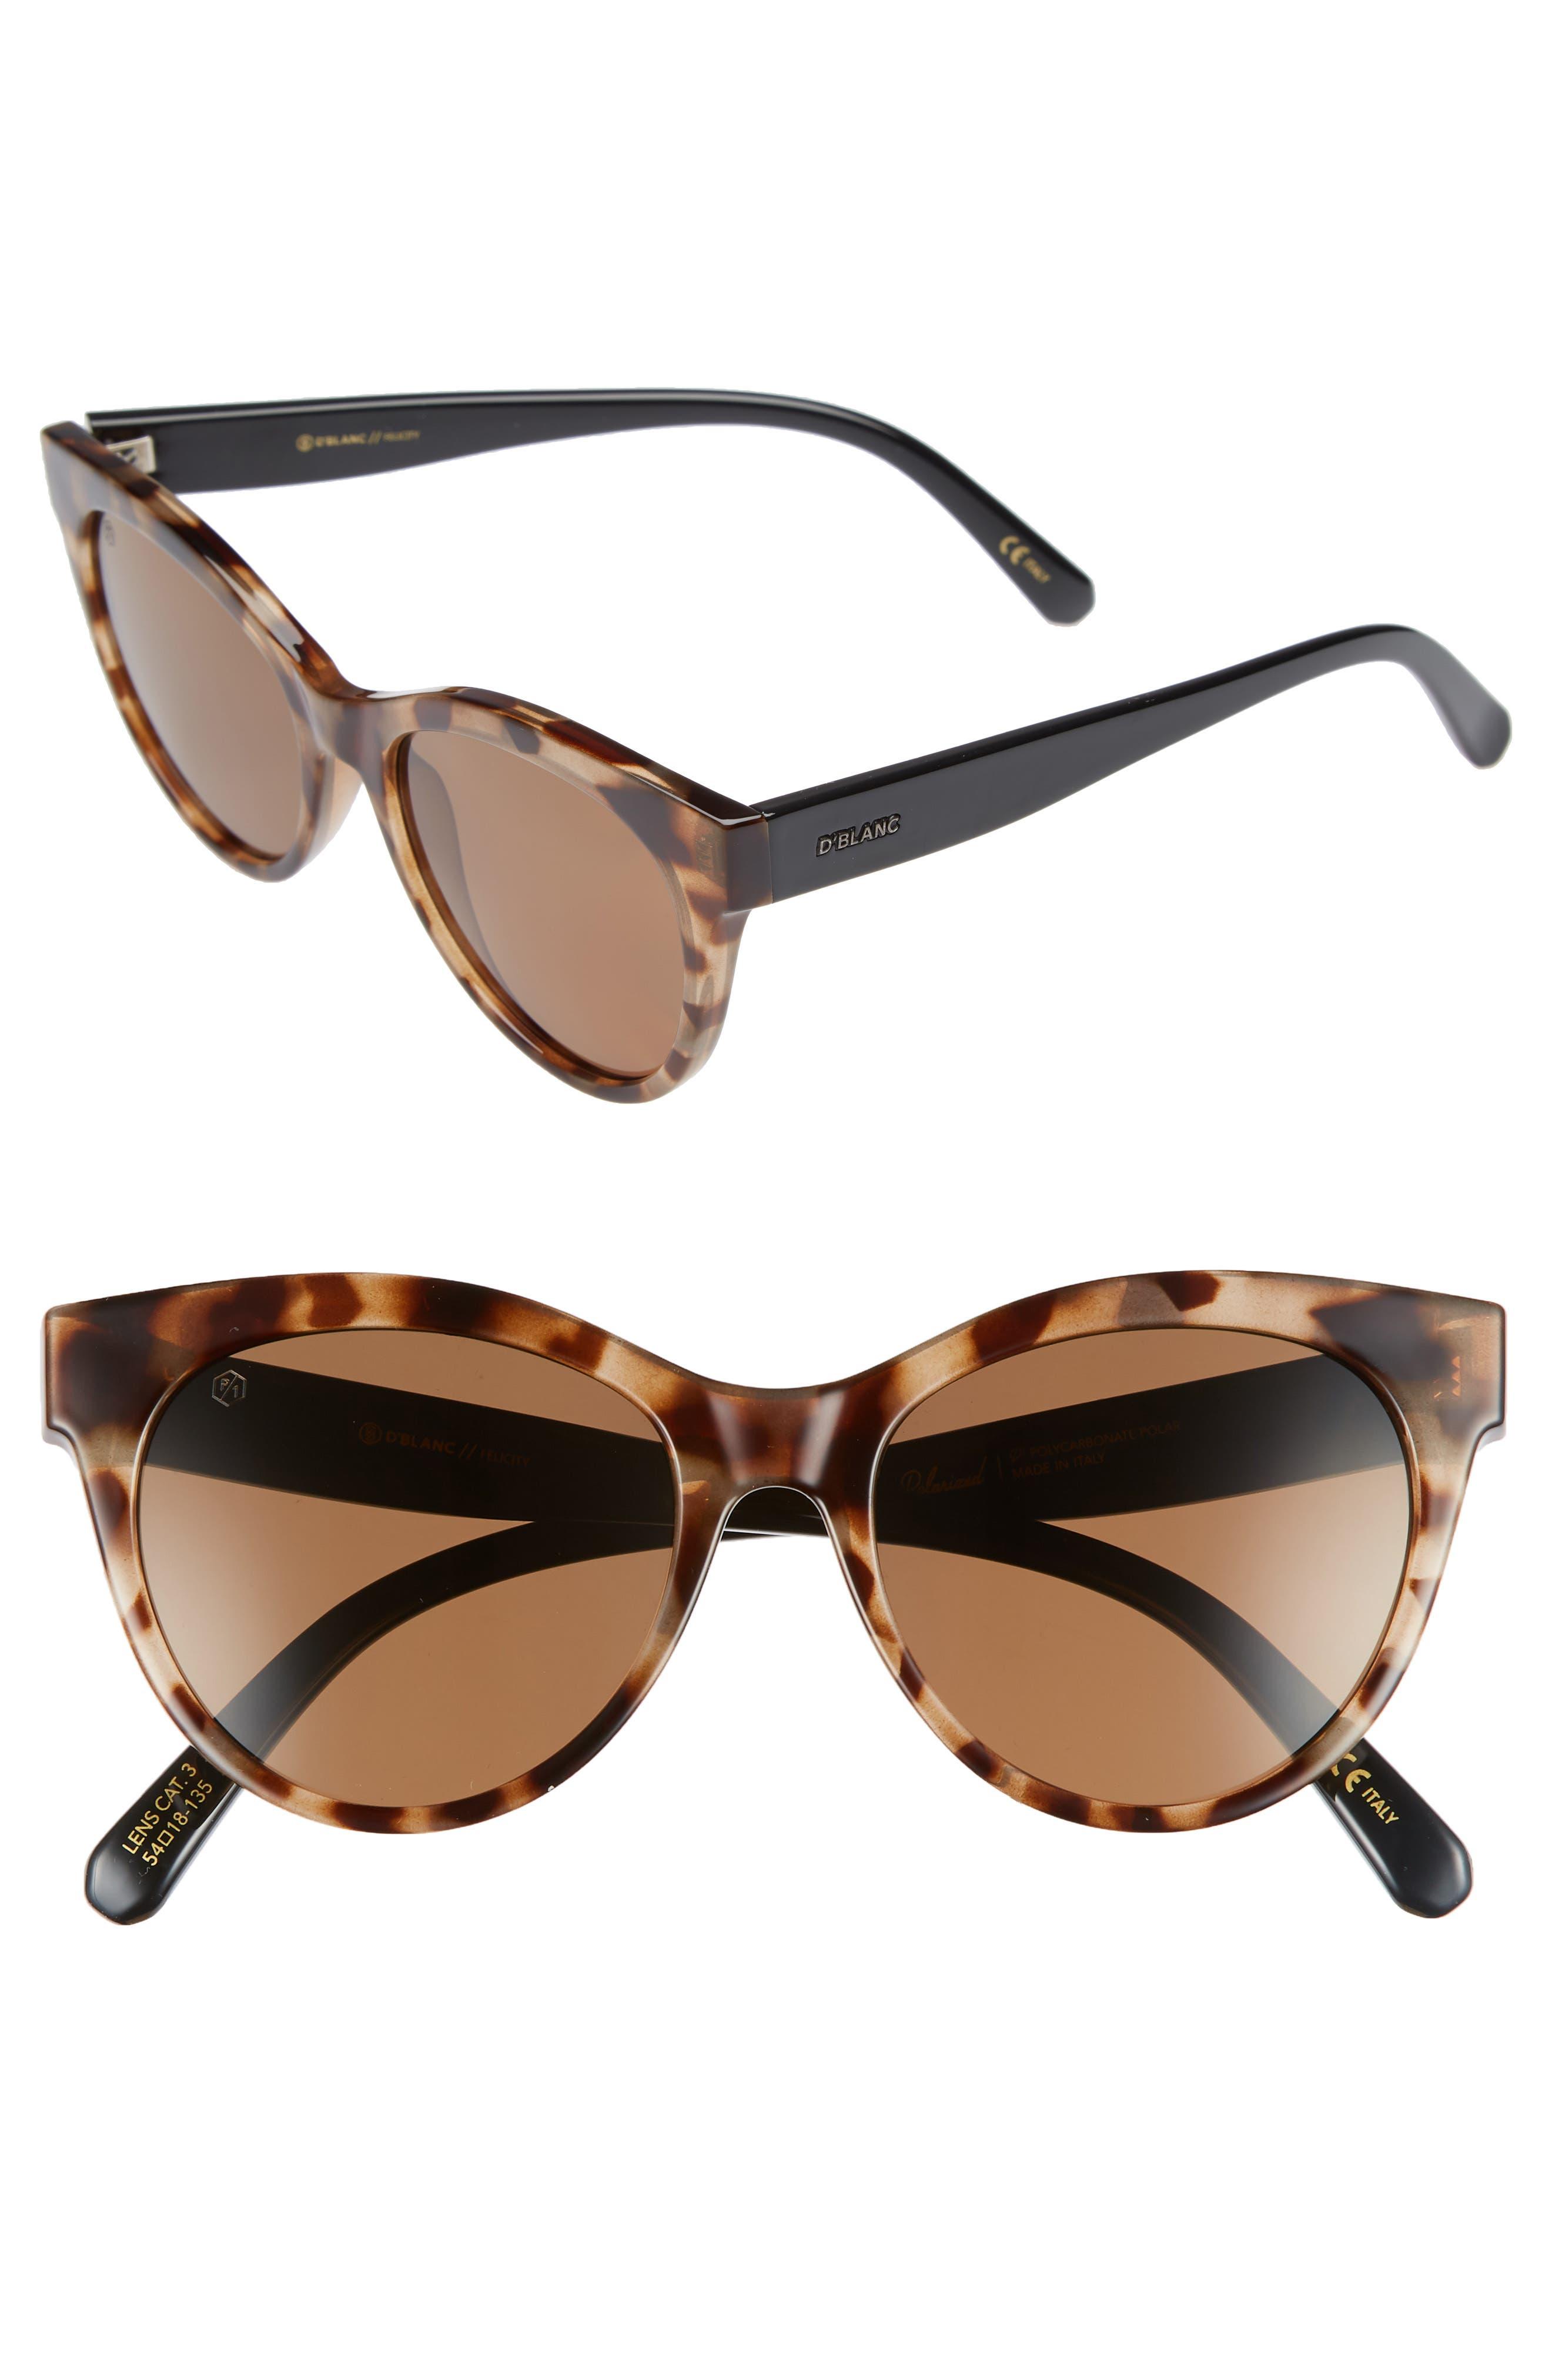 D'BLANC Felicity 54mm Polarized Sunglasses,                         Main,                         color, 200